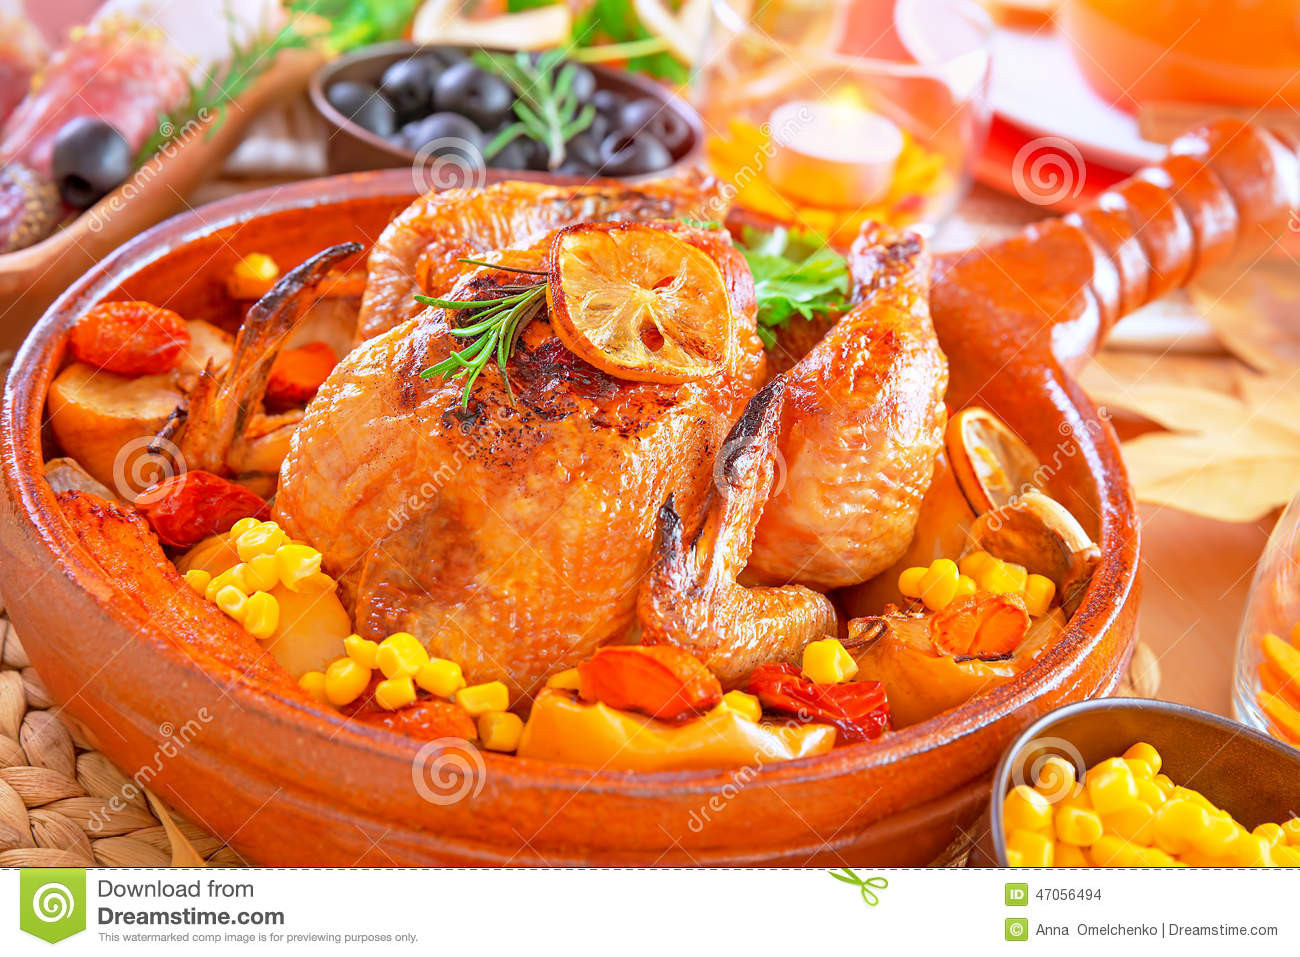 Prepared Turkey For Thanksgiving  Delicious Prepared Thanksgiving Turkey Stock Image